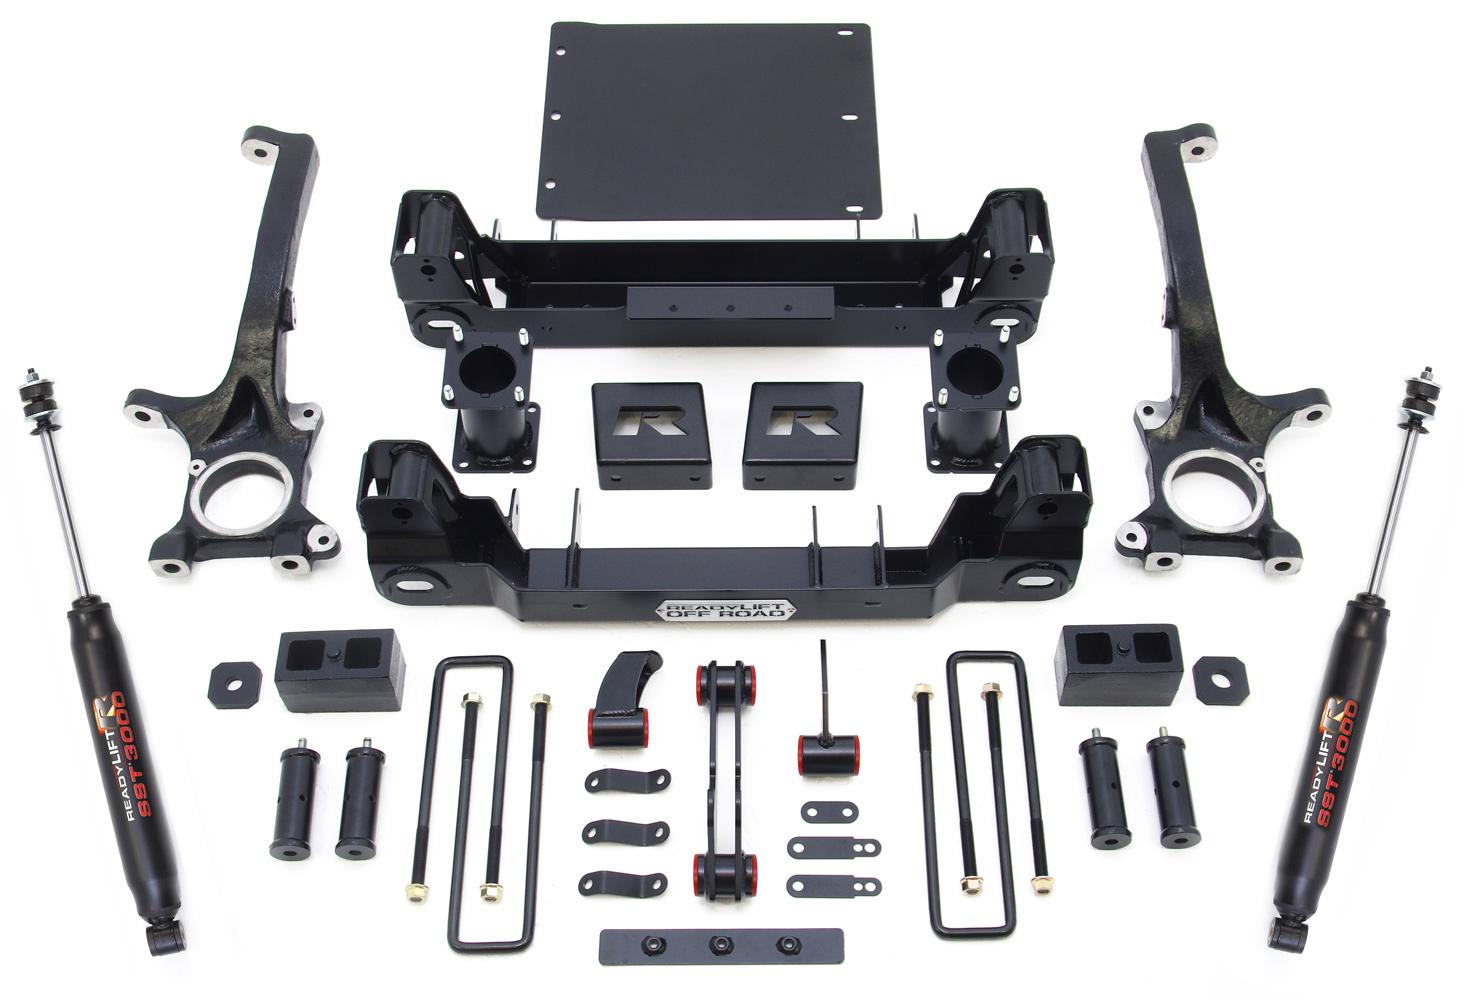 Energy Suspension 3.4107R Control Arm Bushing Mount Set for GM